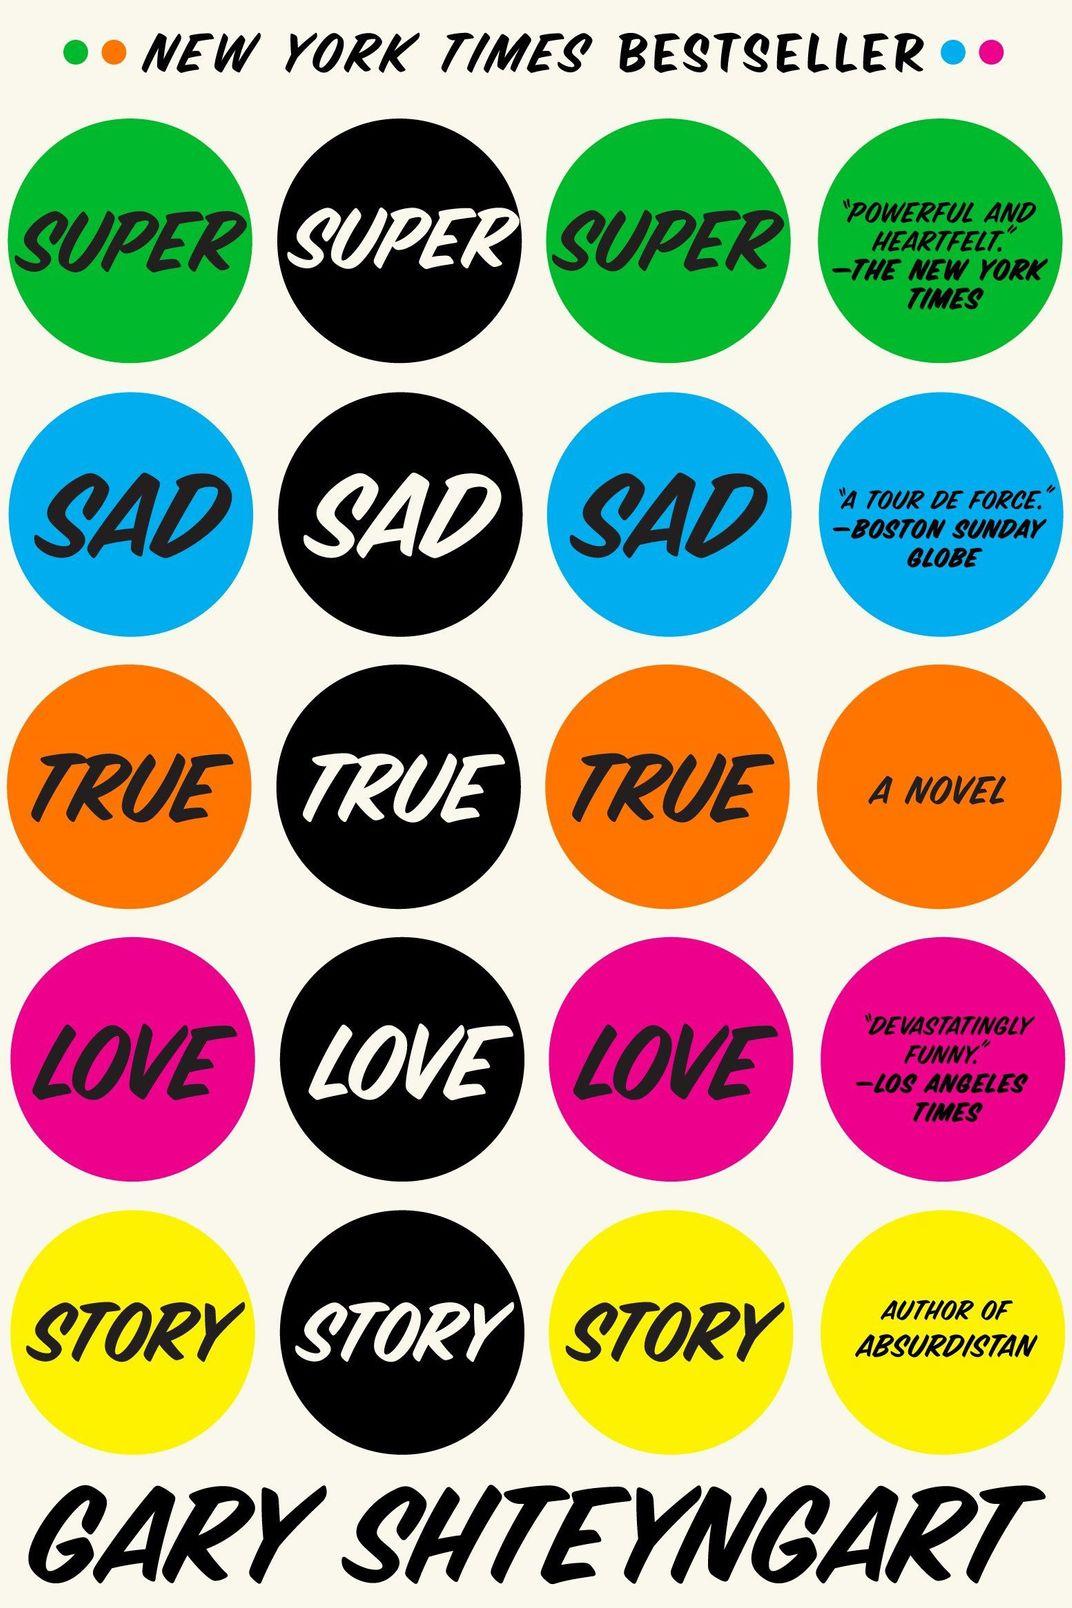 love in la by dagoberto gilb theme